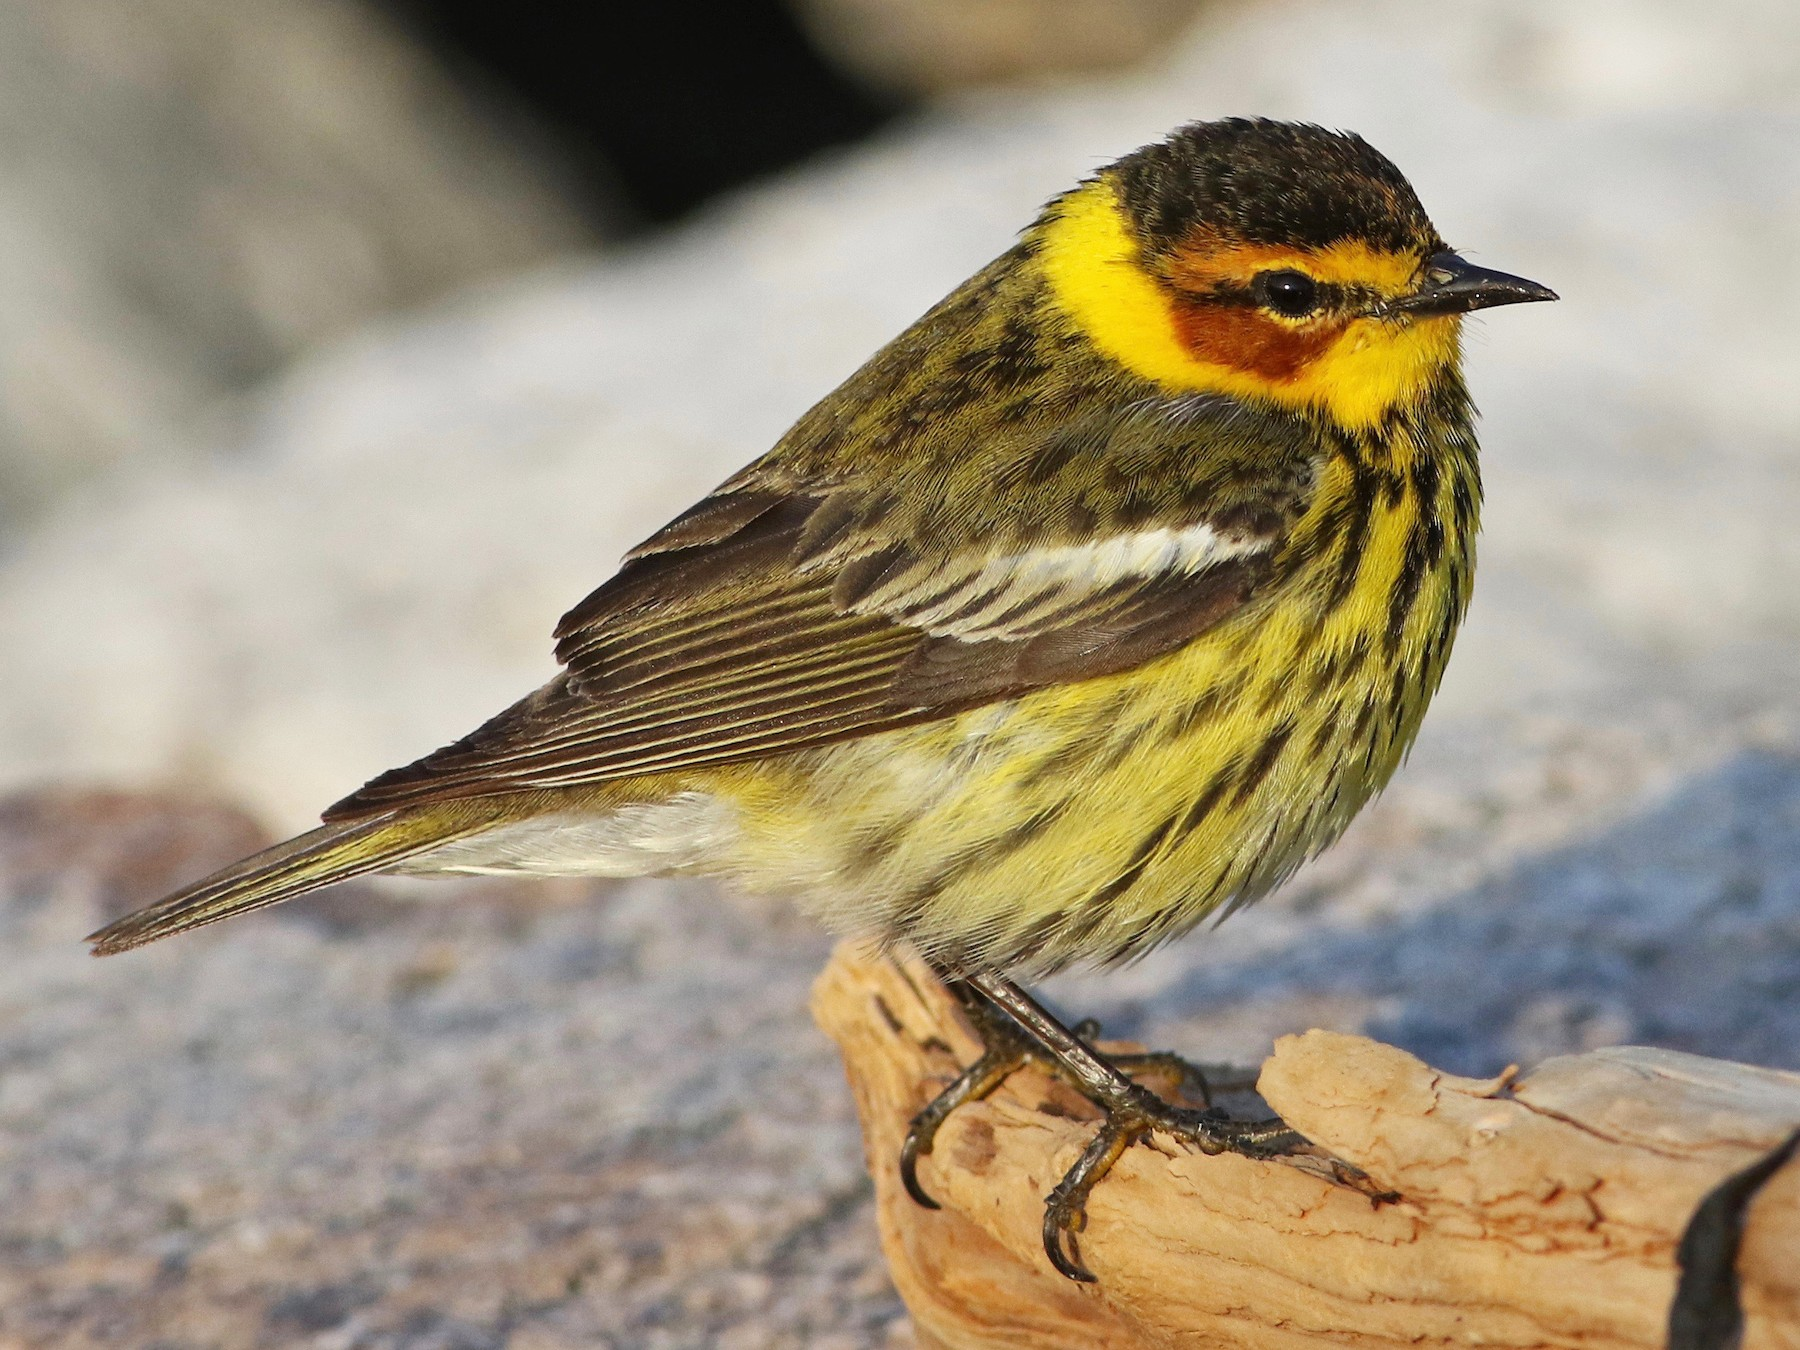 Cape May Warbler - Keenan Yakola